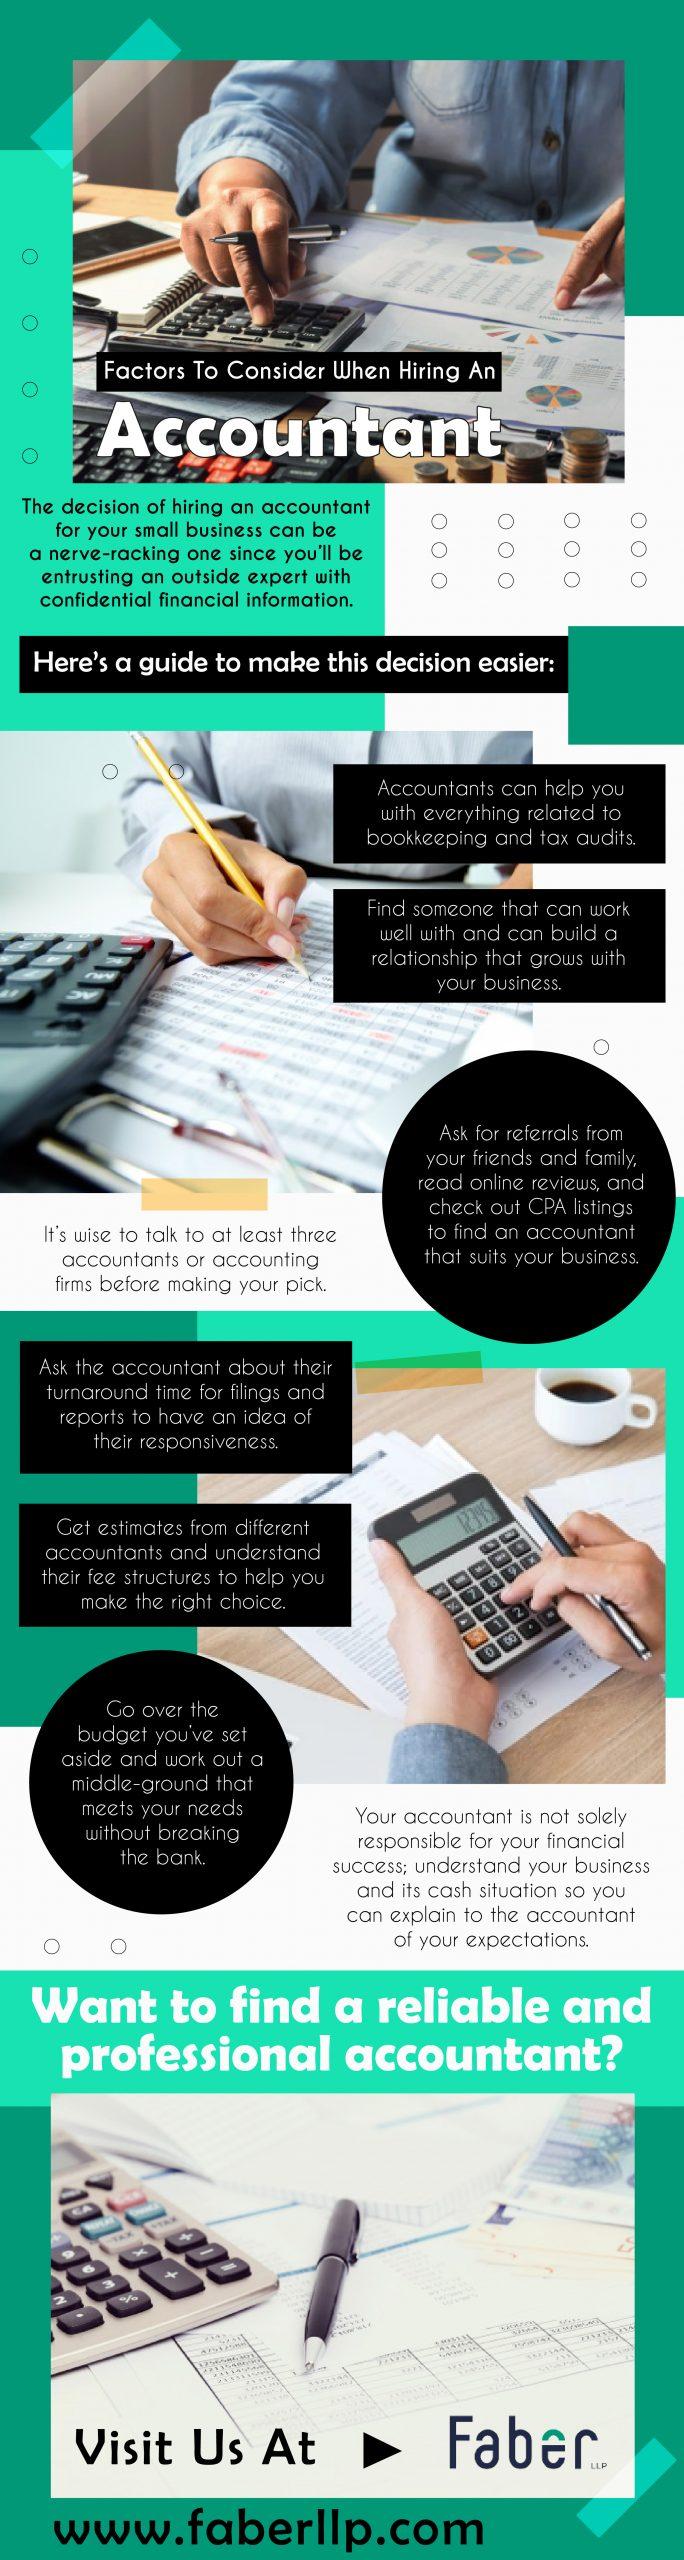 Factors to Consider When Hiring an Accountant - Infograph